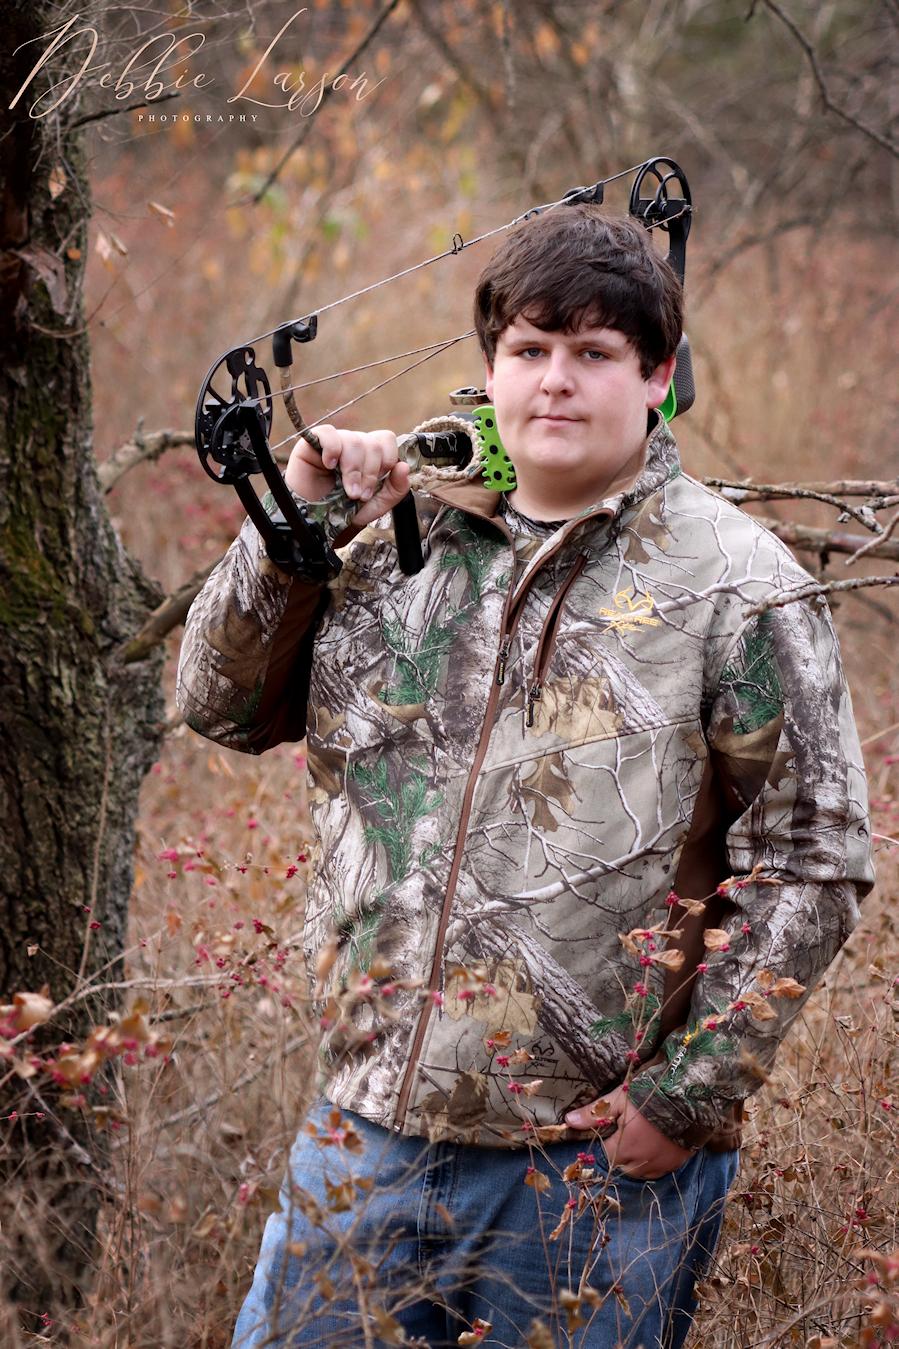 iowa senior hunting picture debbie larson photography